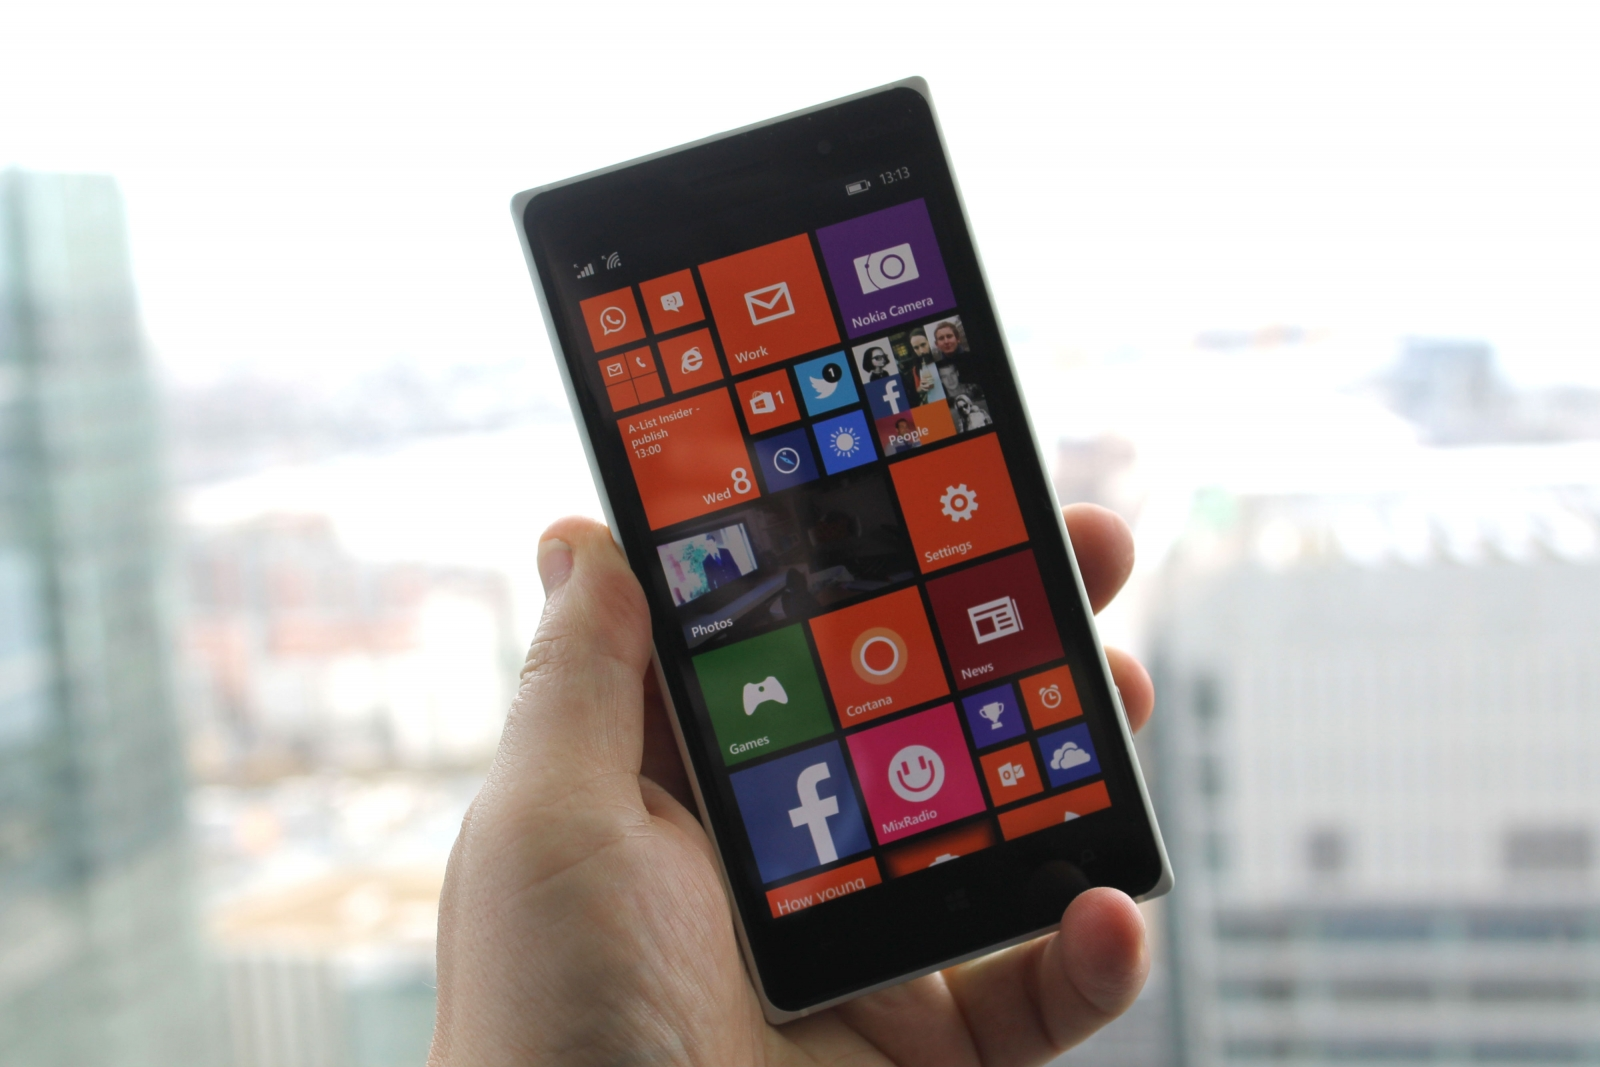 Nokia lumia 830 reviews - Nokia Lumia 830 Reviews 17